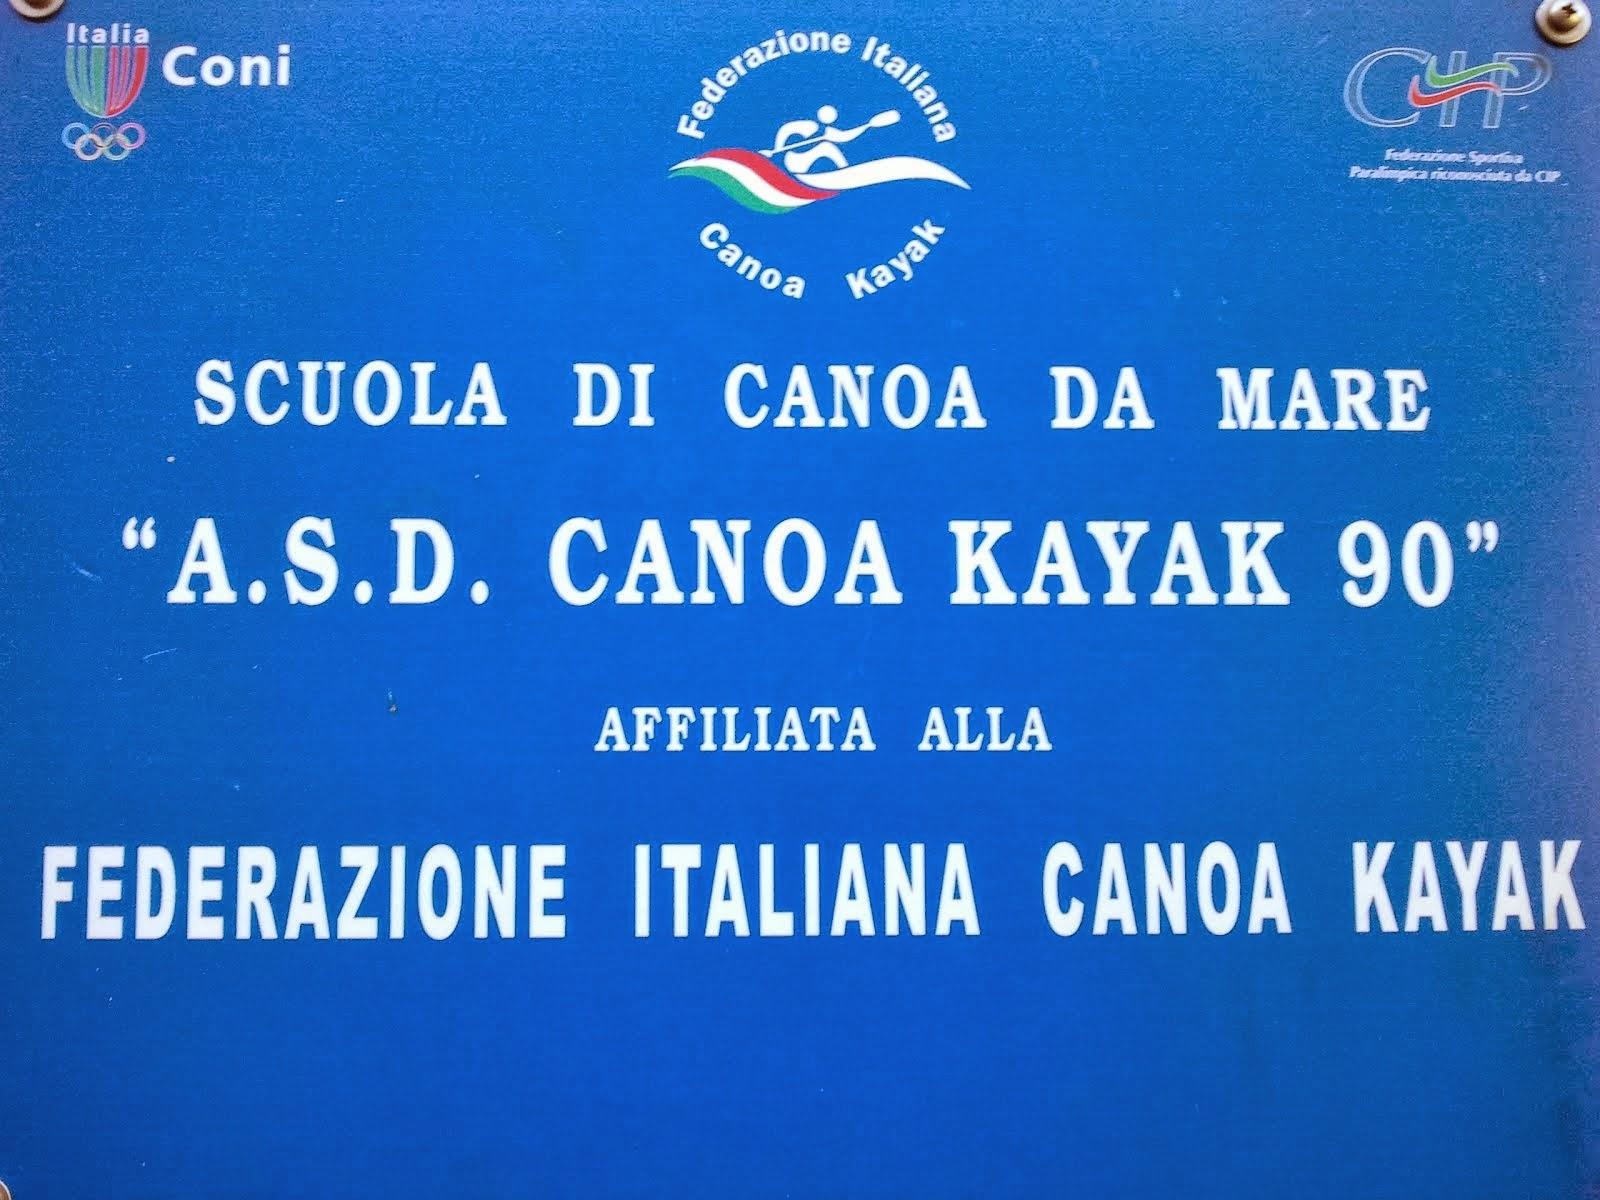 FICK (Federazione Italiana Canoa Kayak)